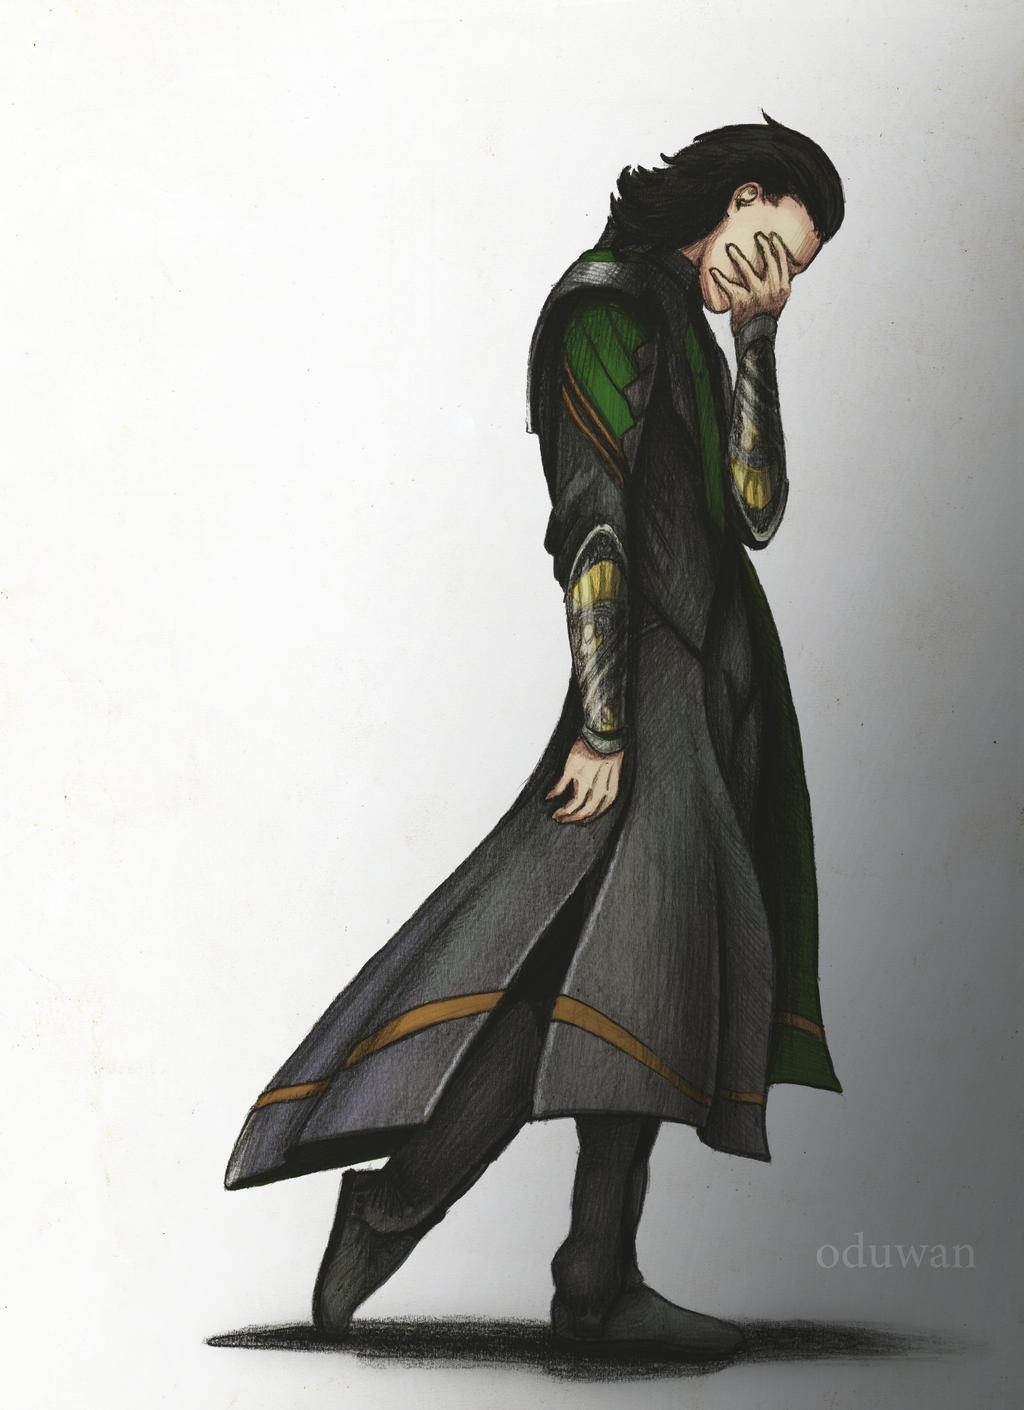 Loki by Oduwan on DeviantArt